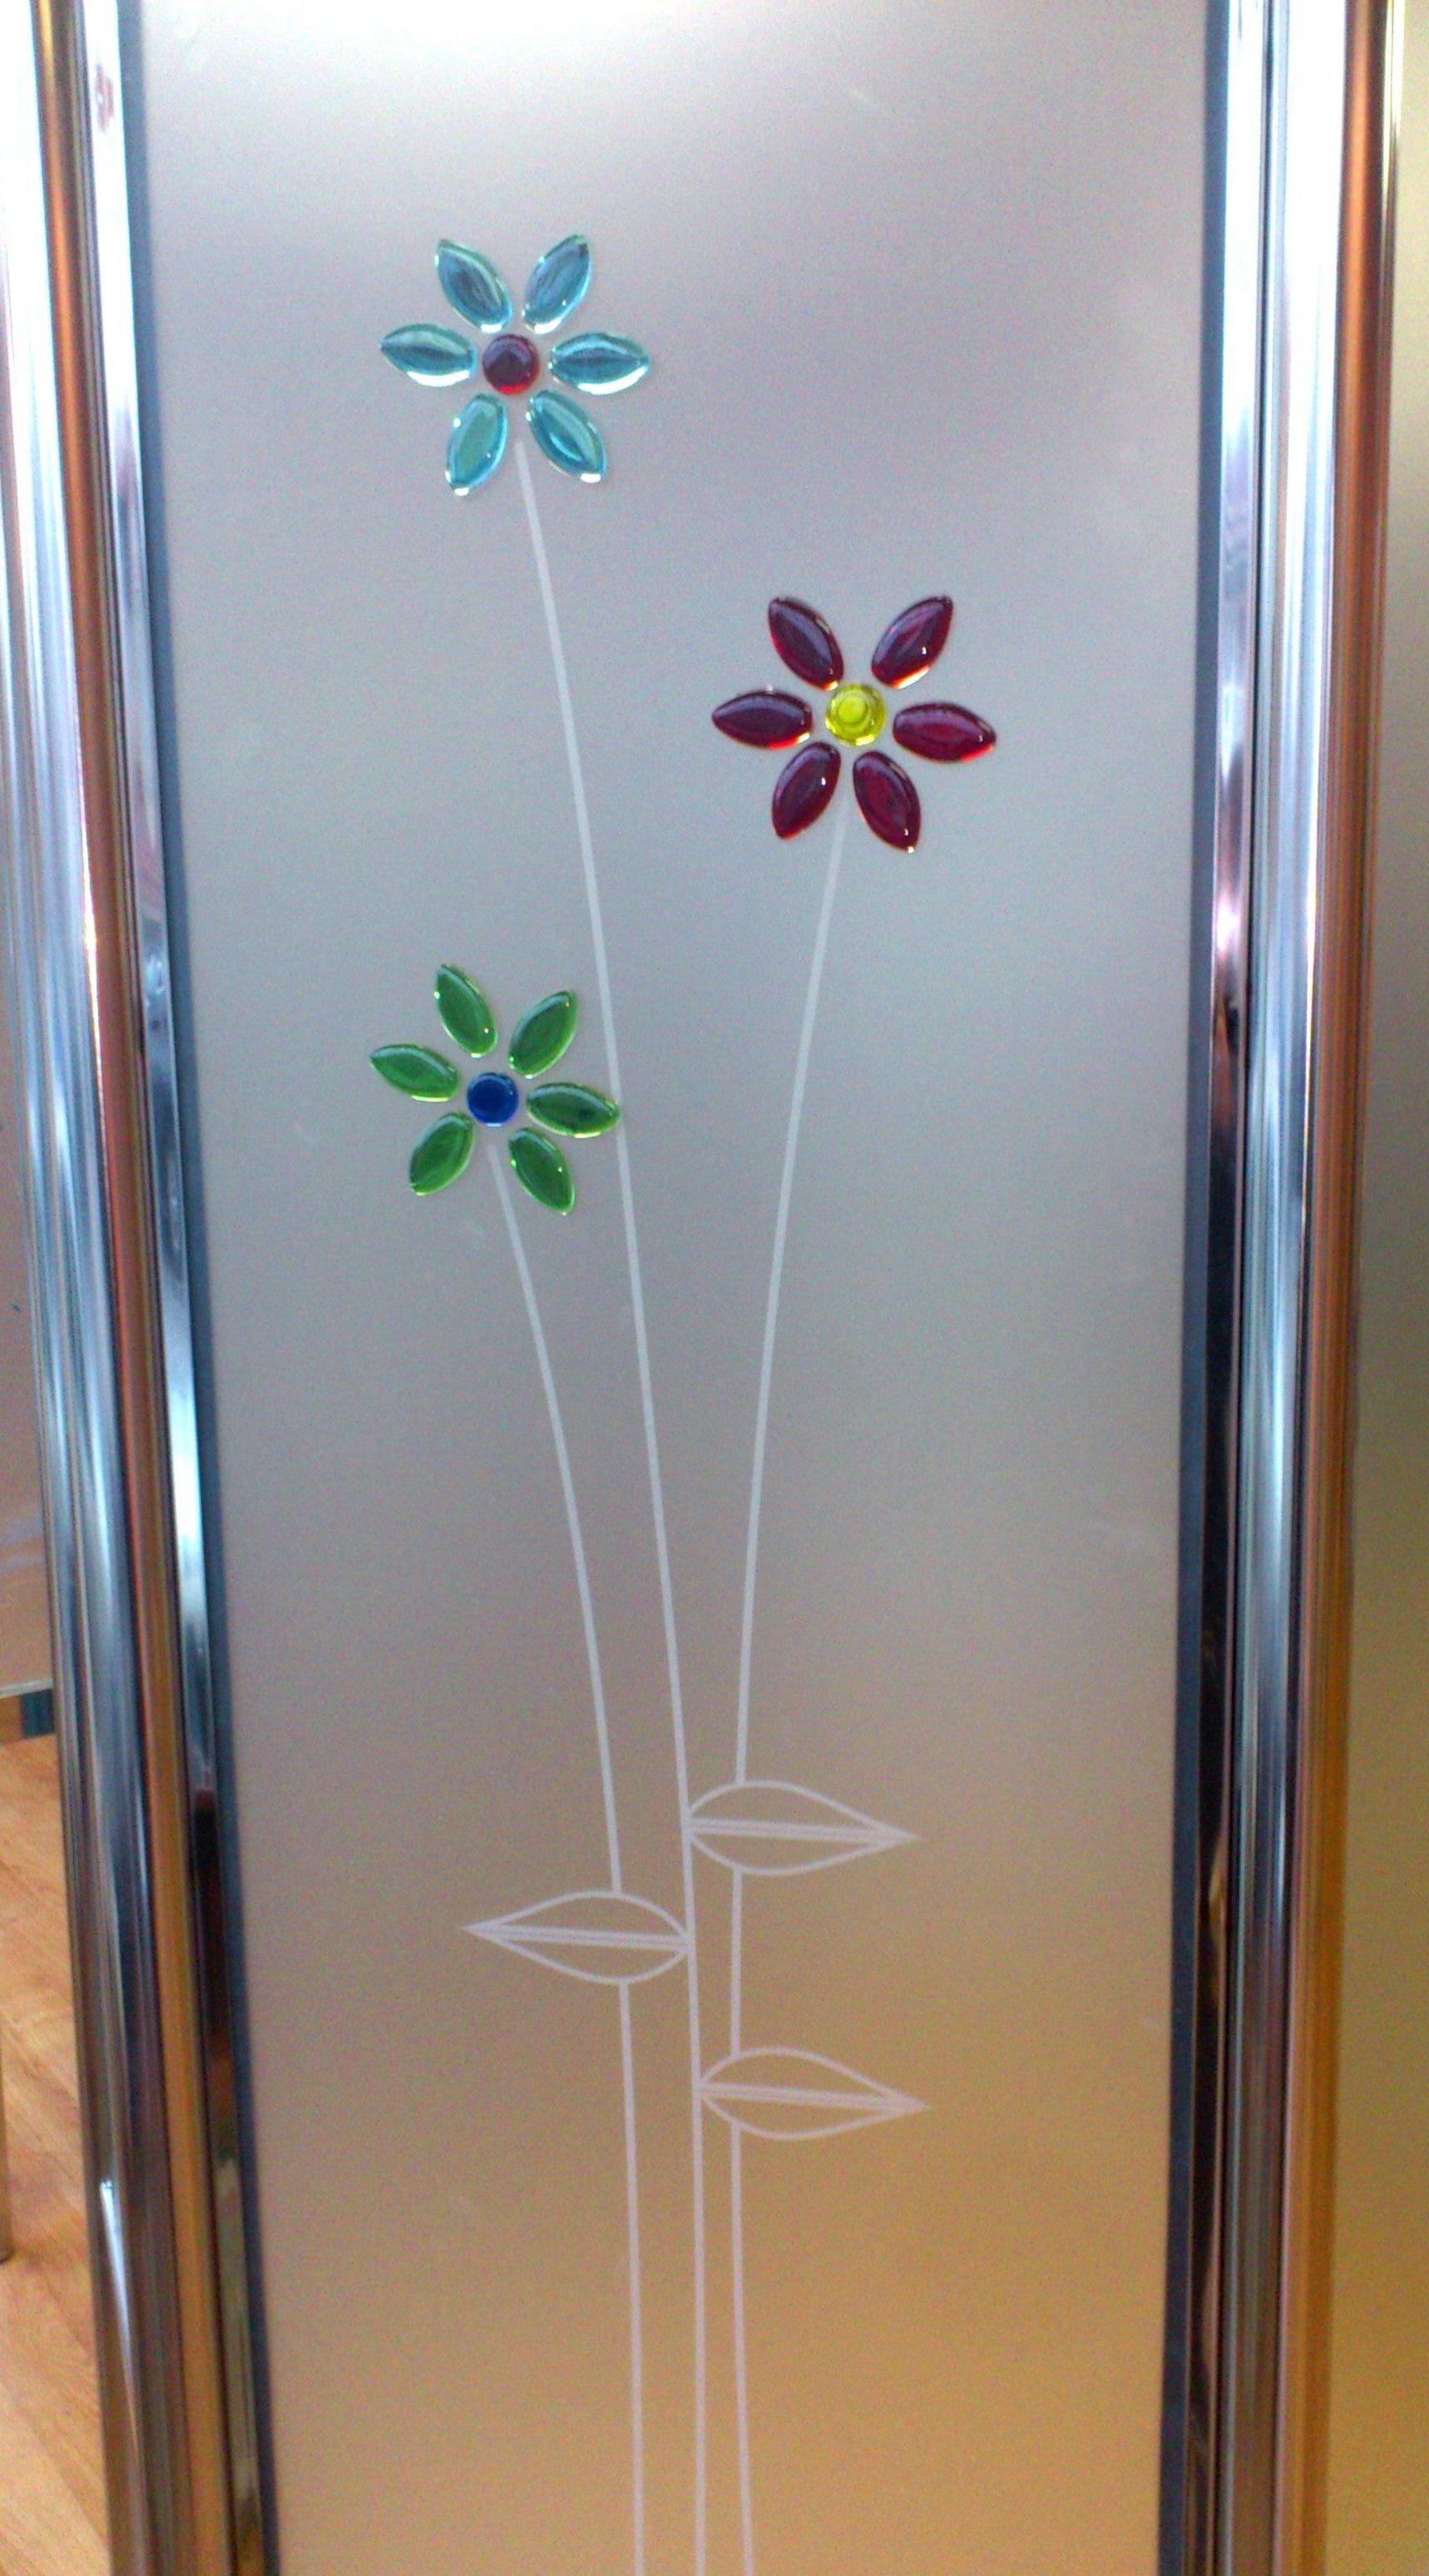 Cristaler a cristal ventanas vidrios ventanas la for Cristales para puertas de interior catalogo